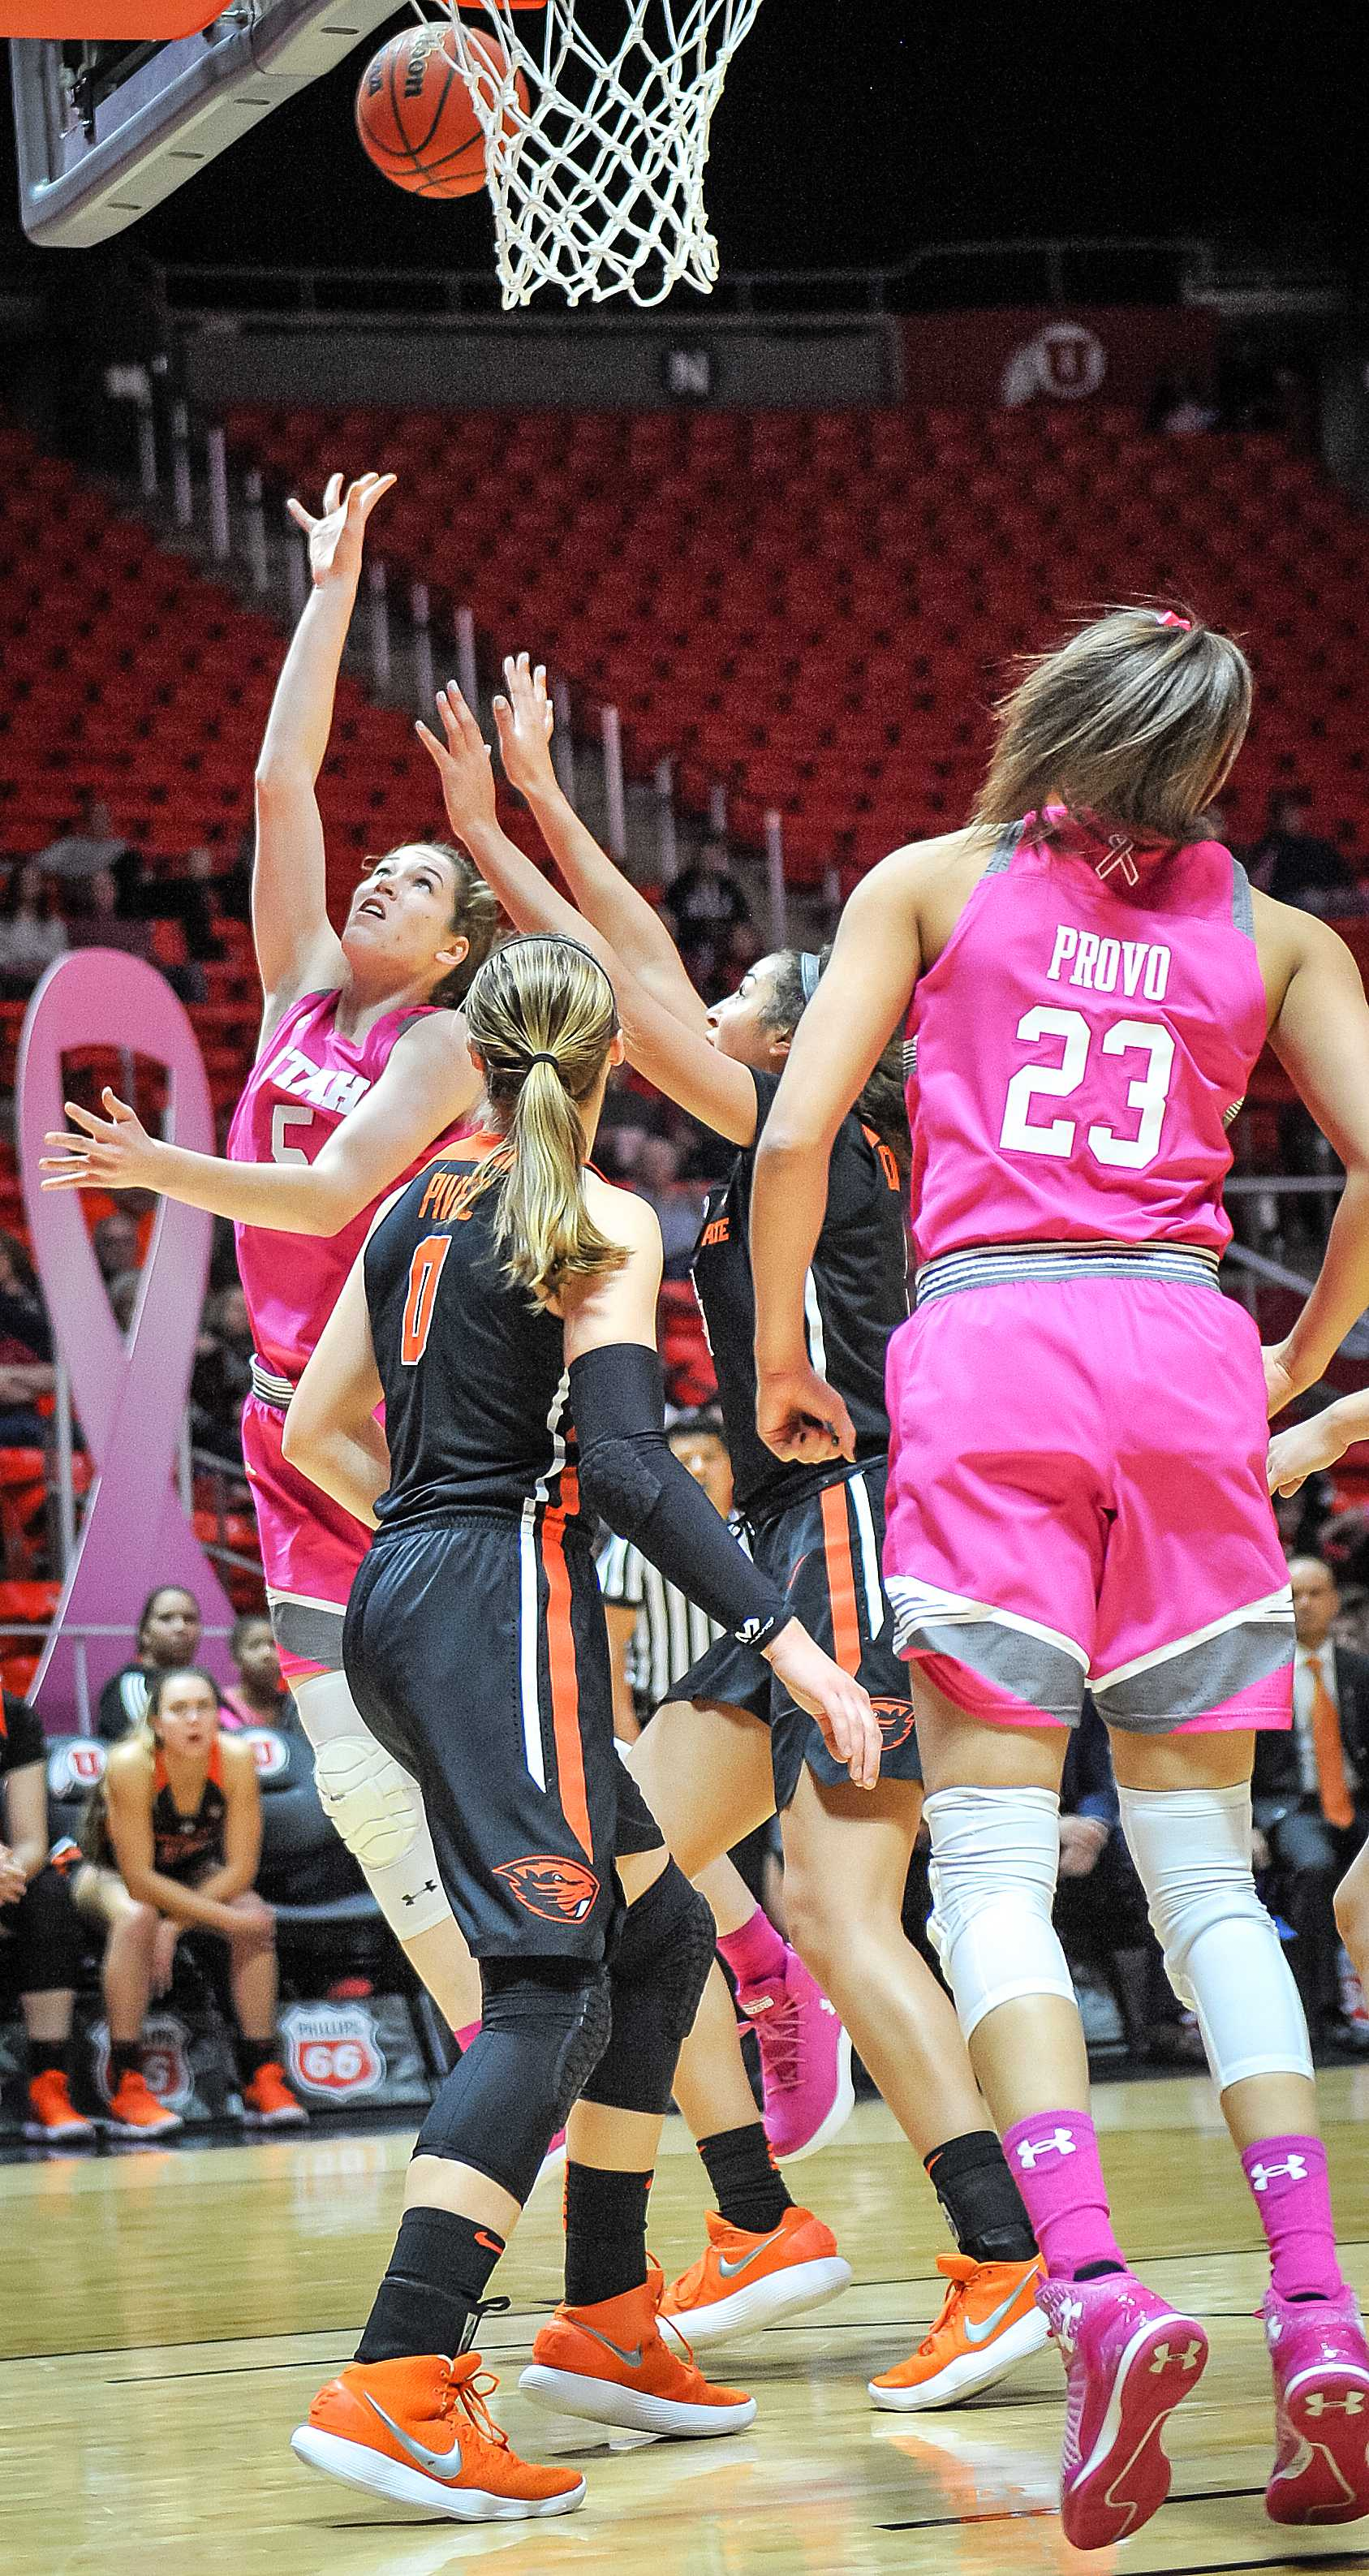 The University of Utah Lady Utes Basketball Team takes on the Oregon State University Beavers in Salt Lake City, UT on Friday, Jan. 26, 2018  (Photo by Adam Fondren   Daily Utah Chronicle)